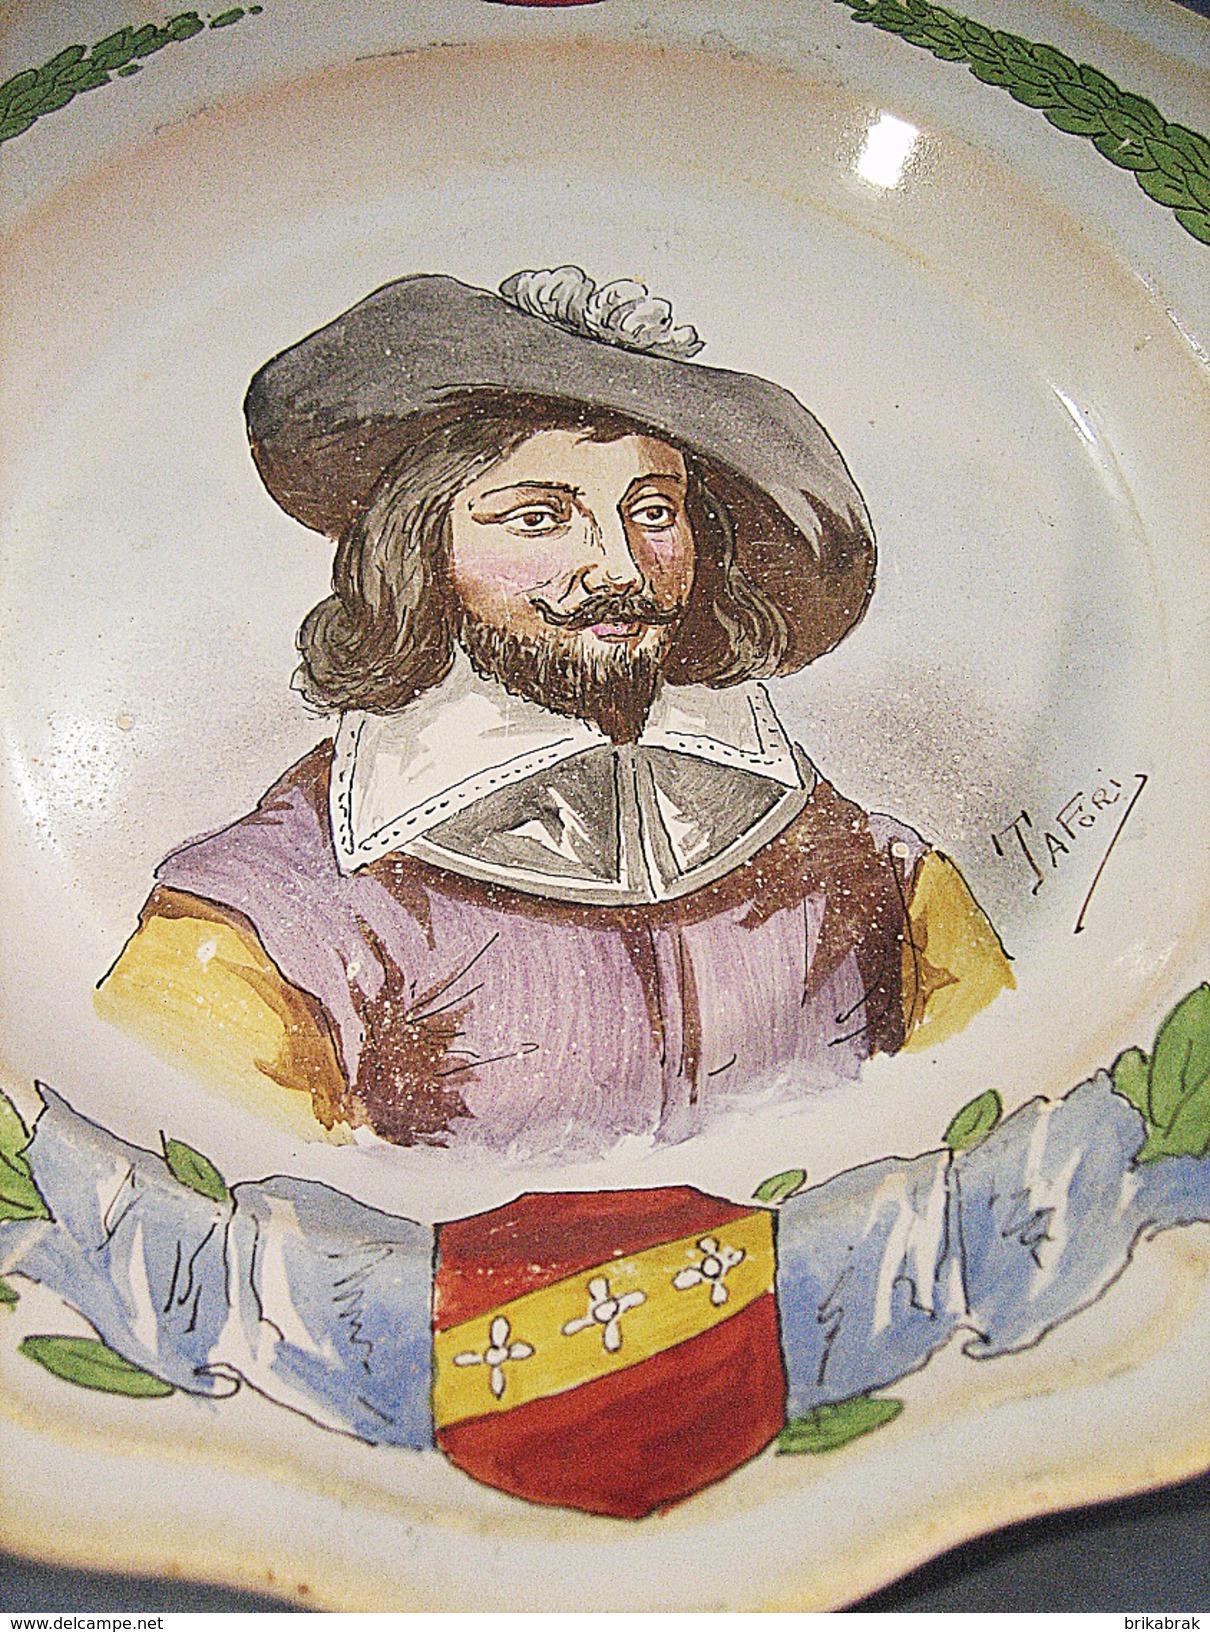 *ASSIETTE FAIENCERIE NIEDERWILLER DECOR SIGNE TAFORI - Tête Dessin Cuisine - Niderviller (FRA)